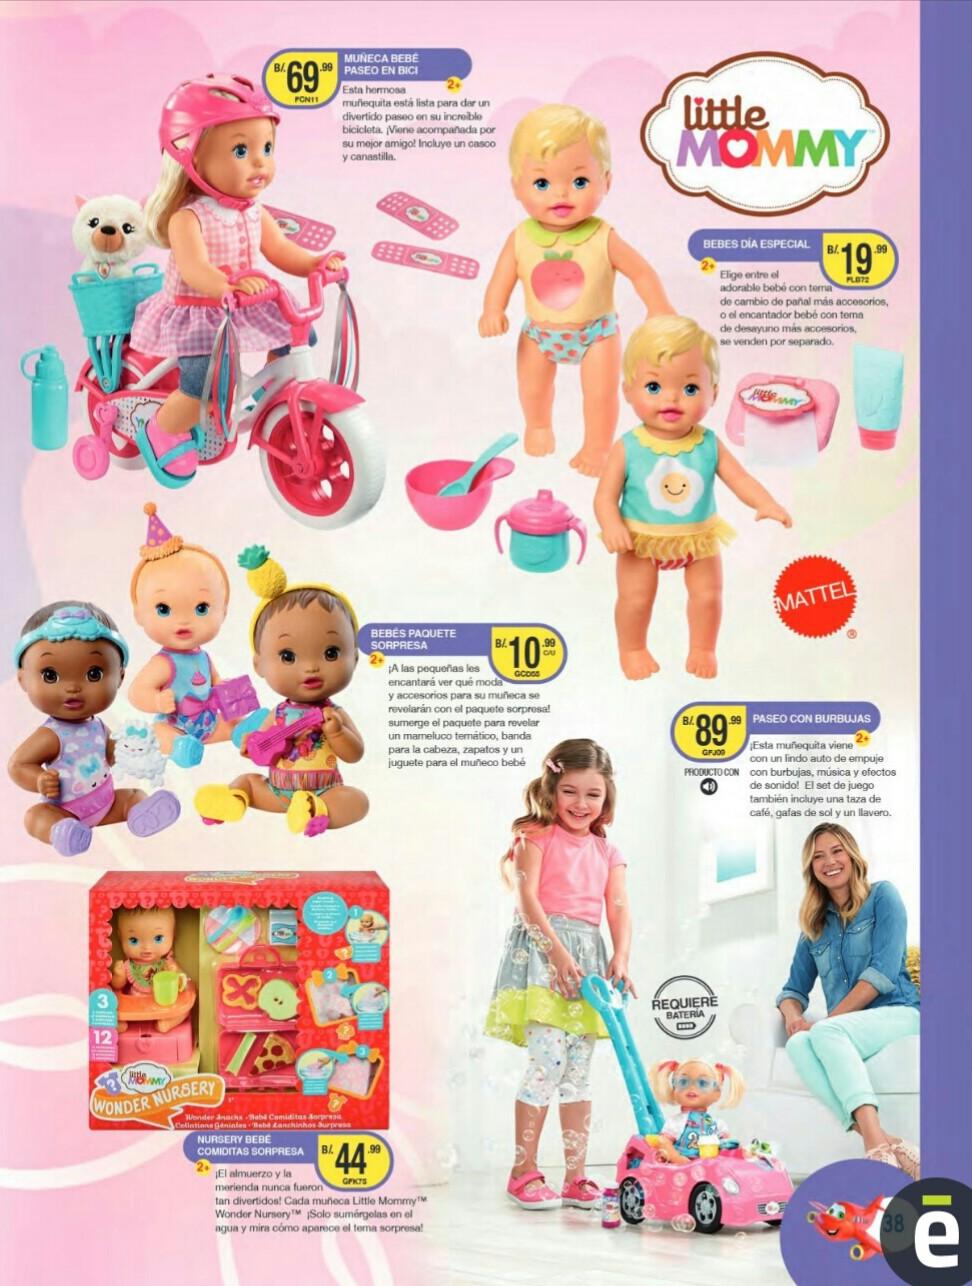 Catalogo juguetes Titan Toys 2019 p38